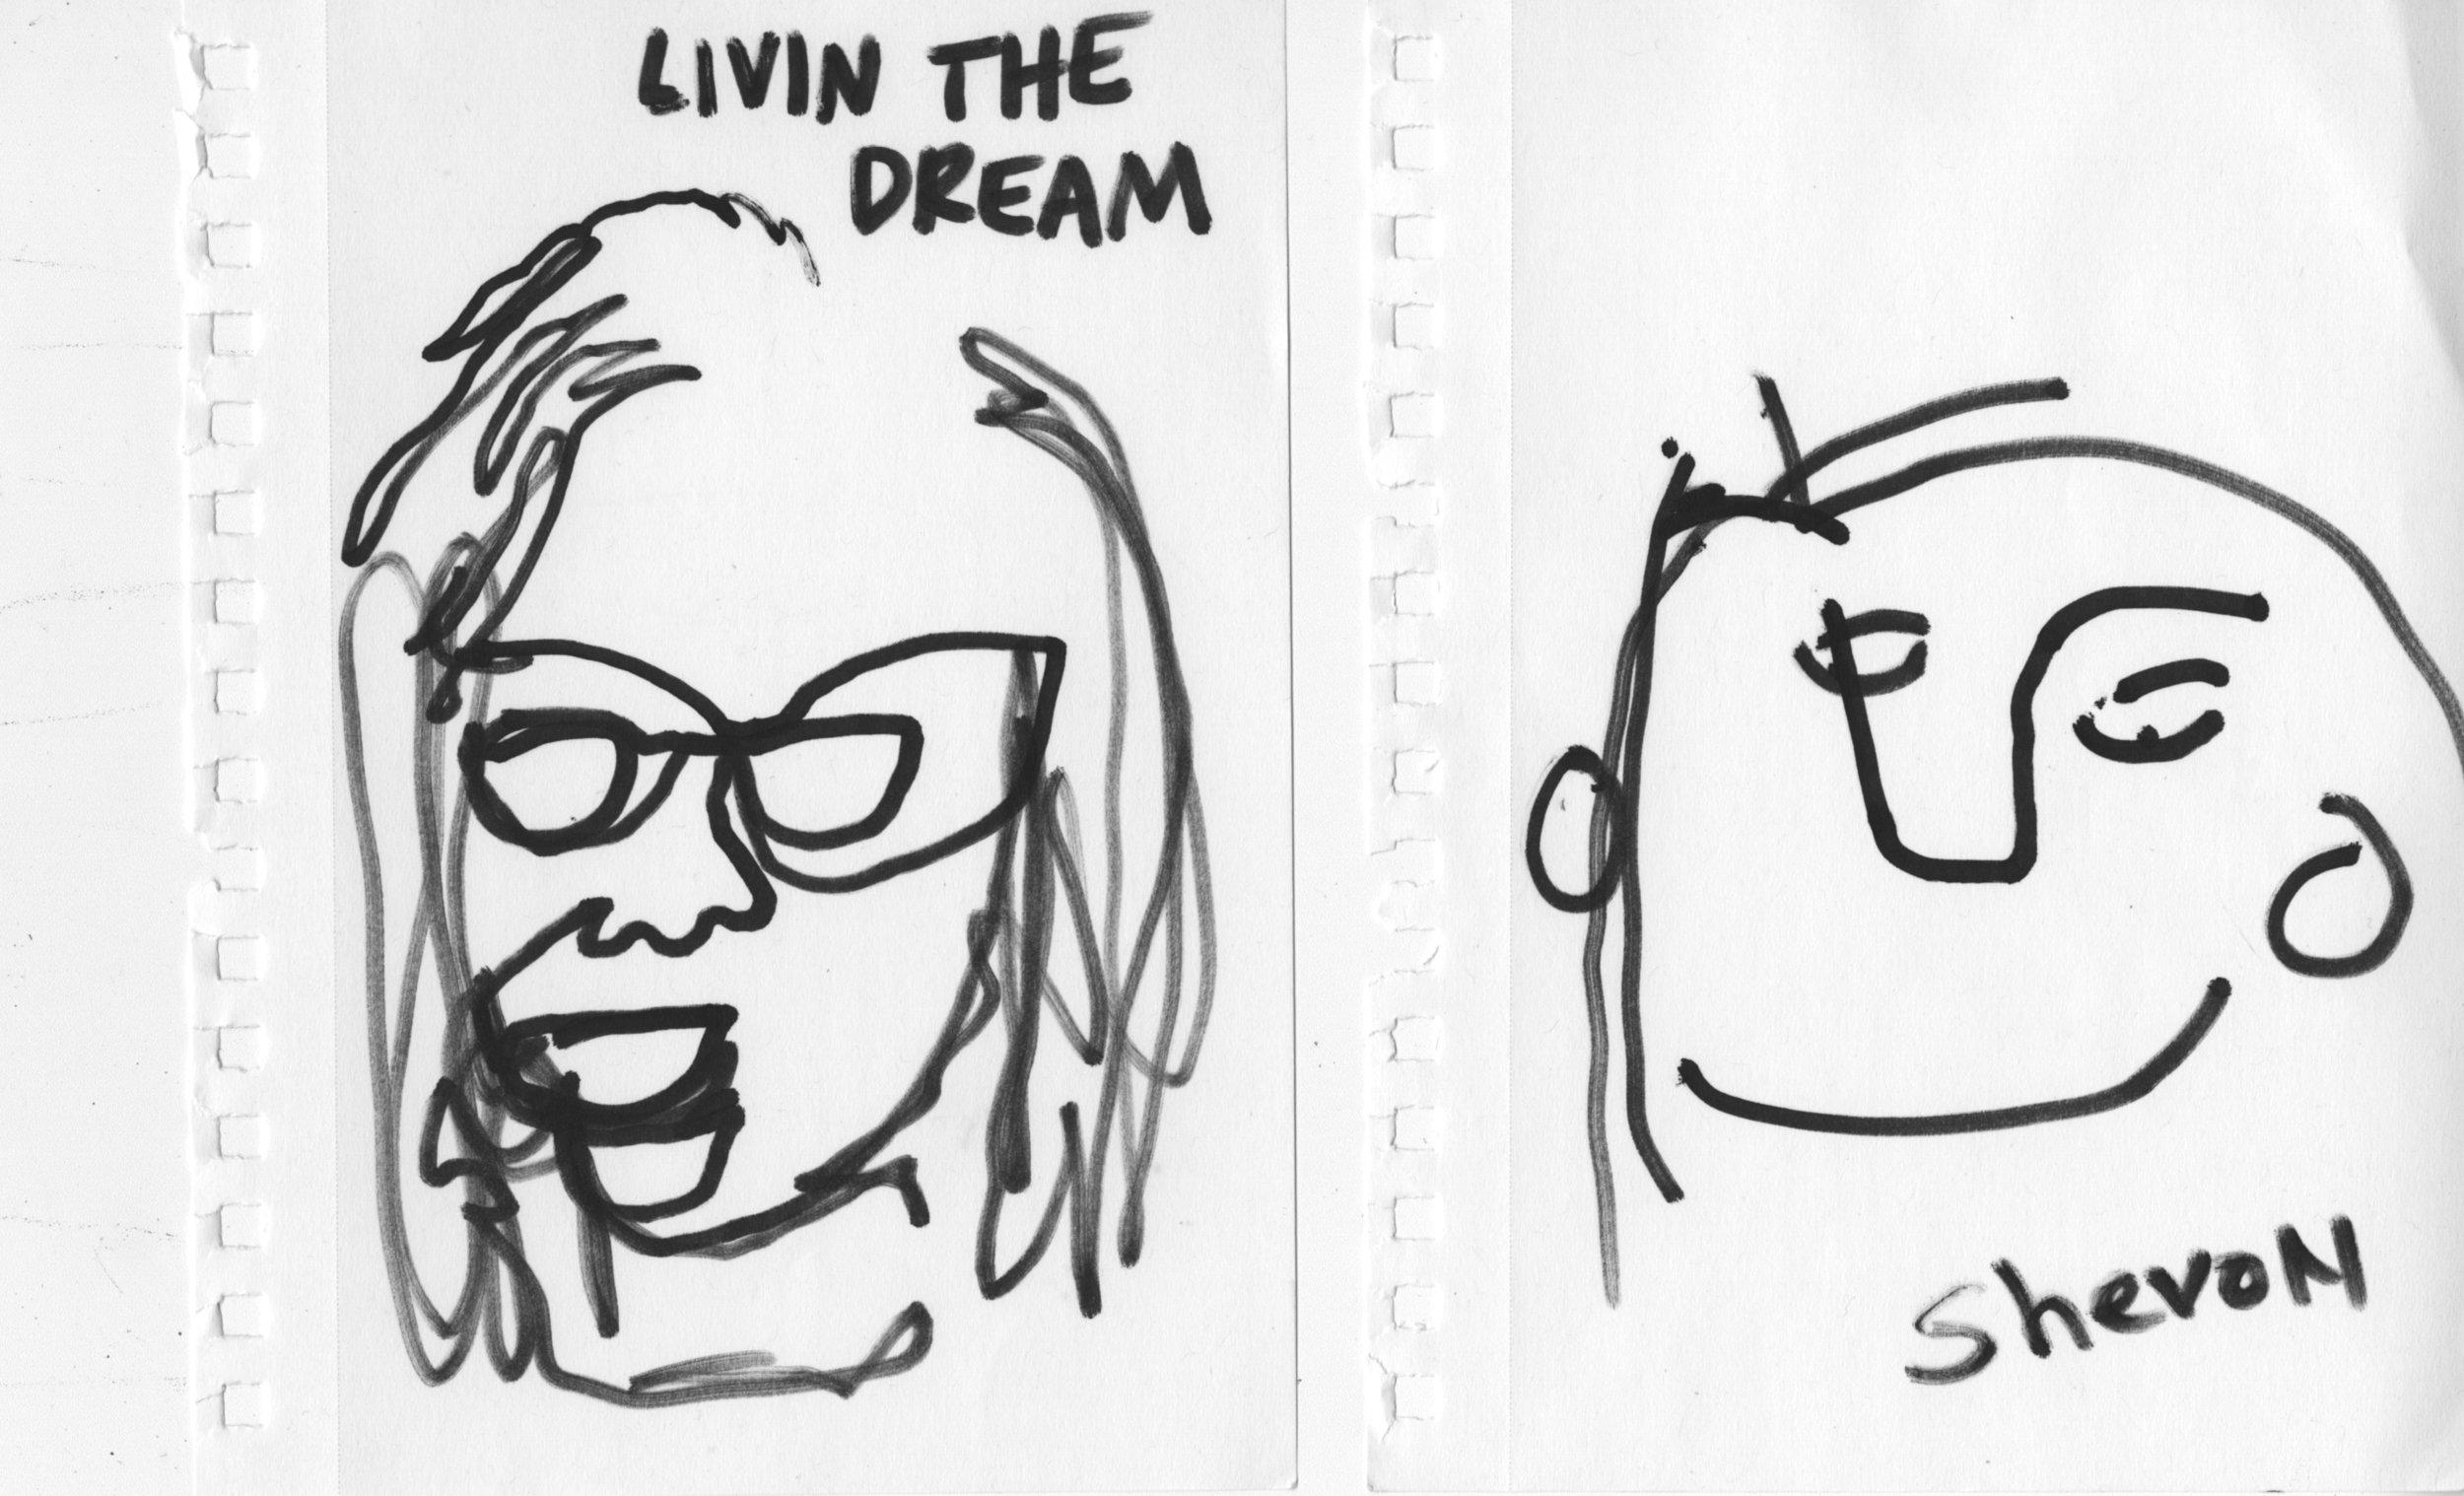 7_Shevon_Livin the Dream.jpg